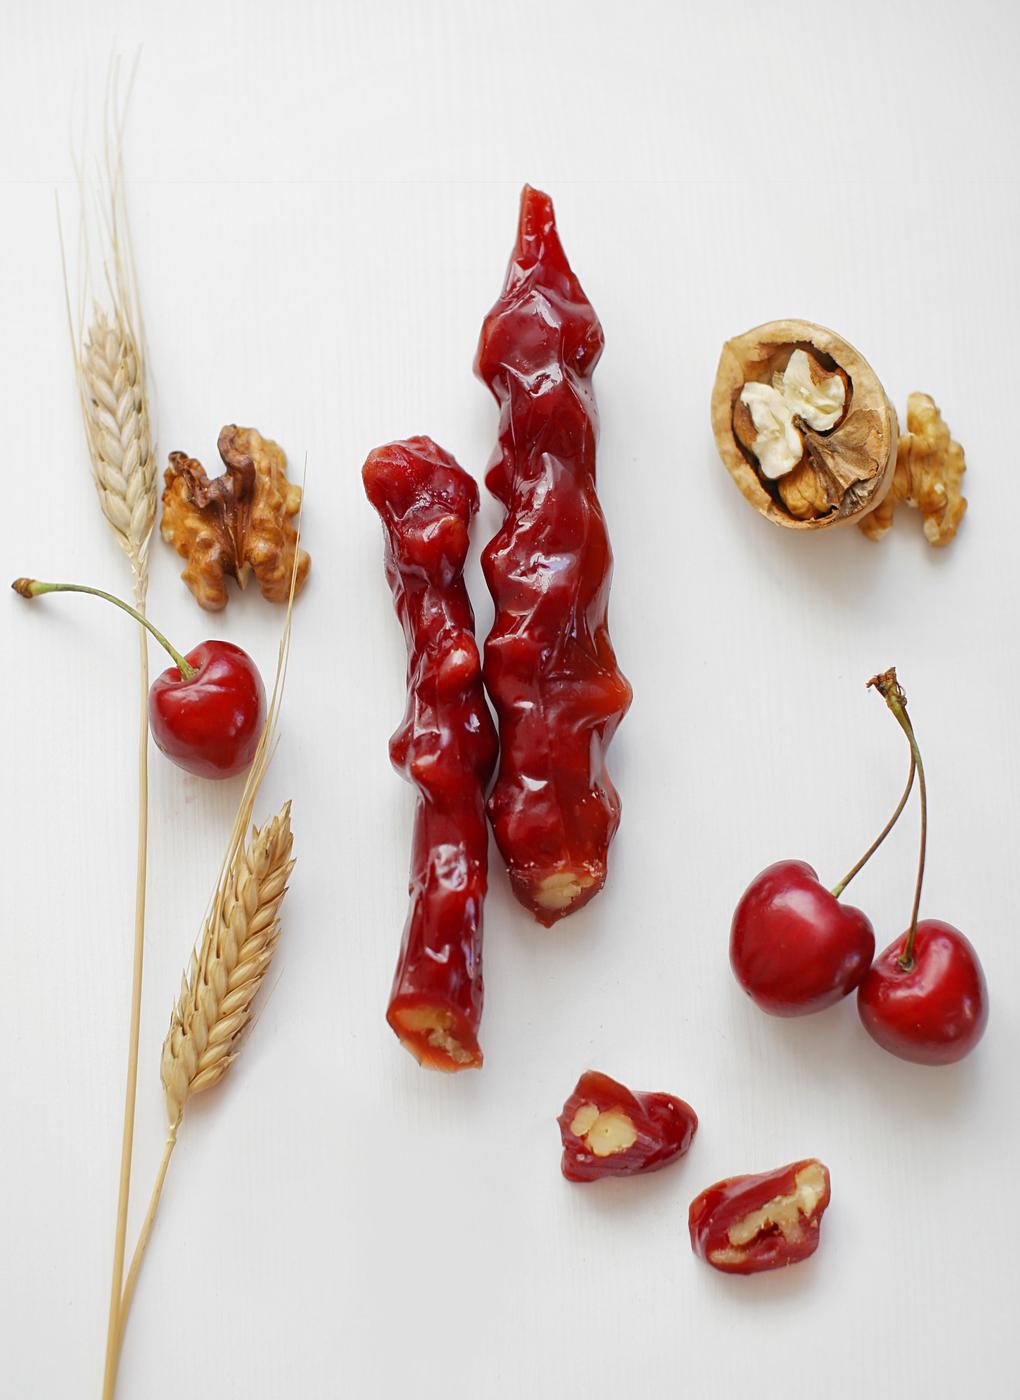 Фото - Чуч-хела вишневая с грецким орехом Ремесло вкуса чуч хела виноградная темная с грецким орехом ремесло вкуса